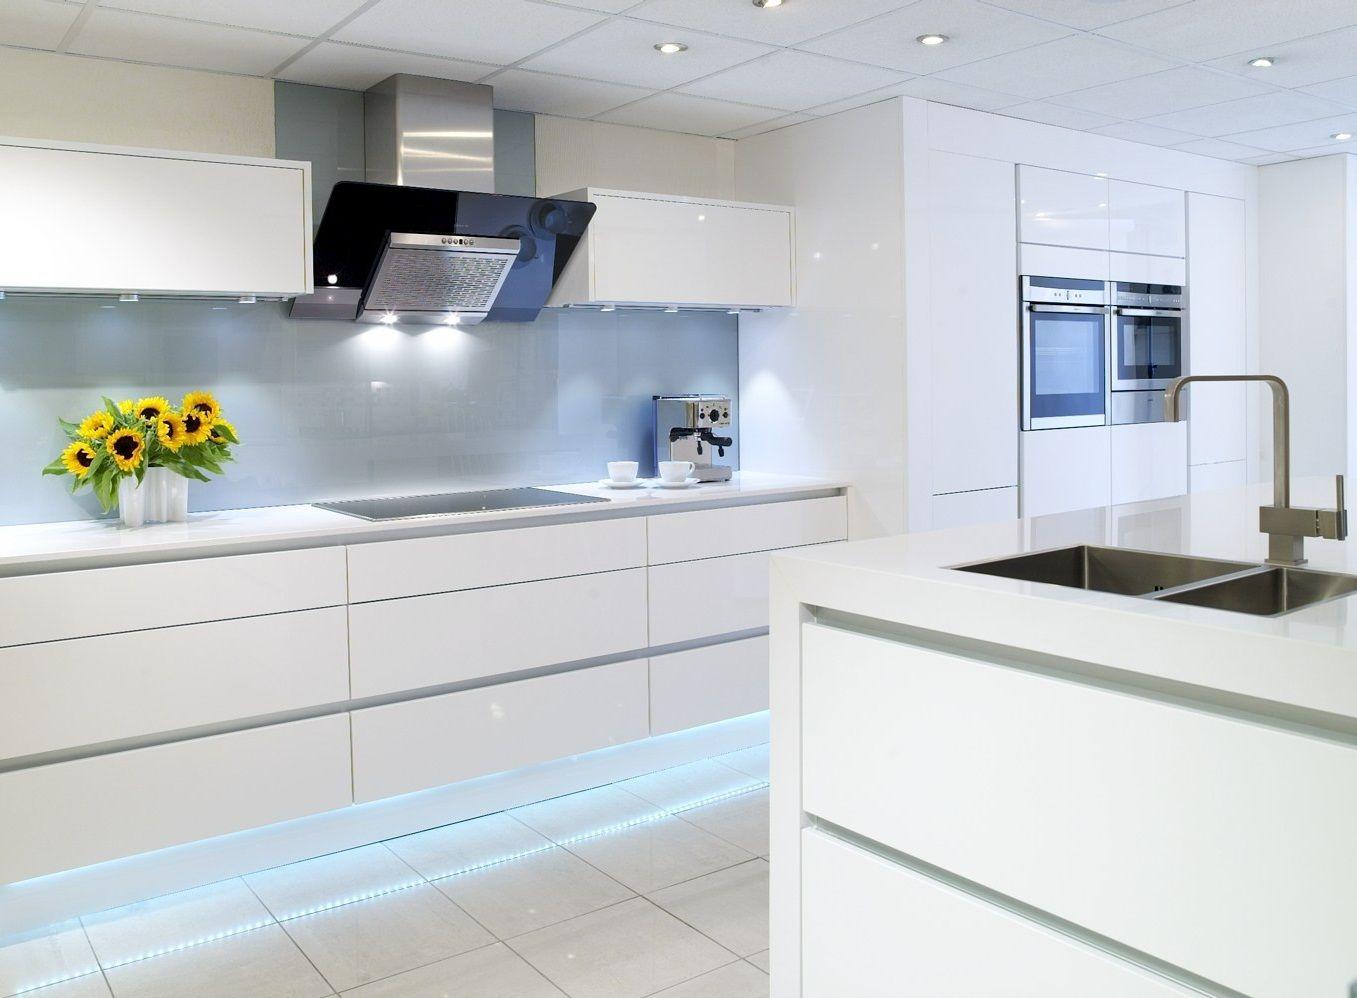 Top 9 Best White Bright Kitchen Design Ideas   Pouted.com   White ...